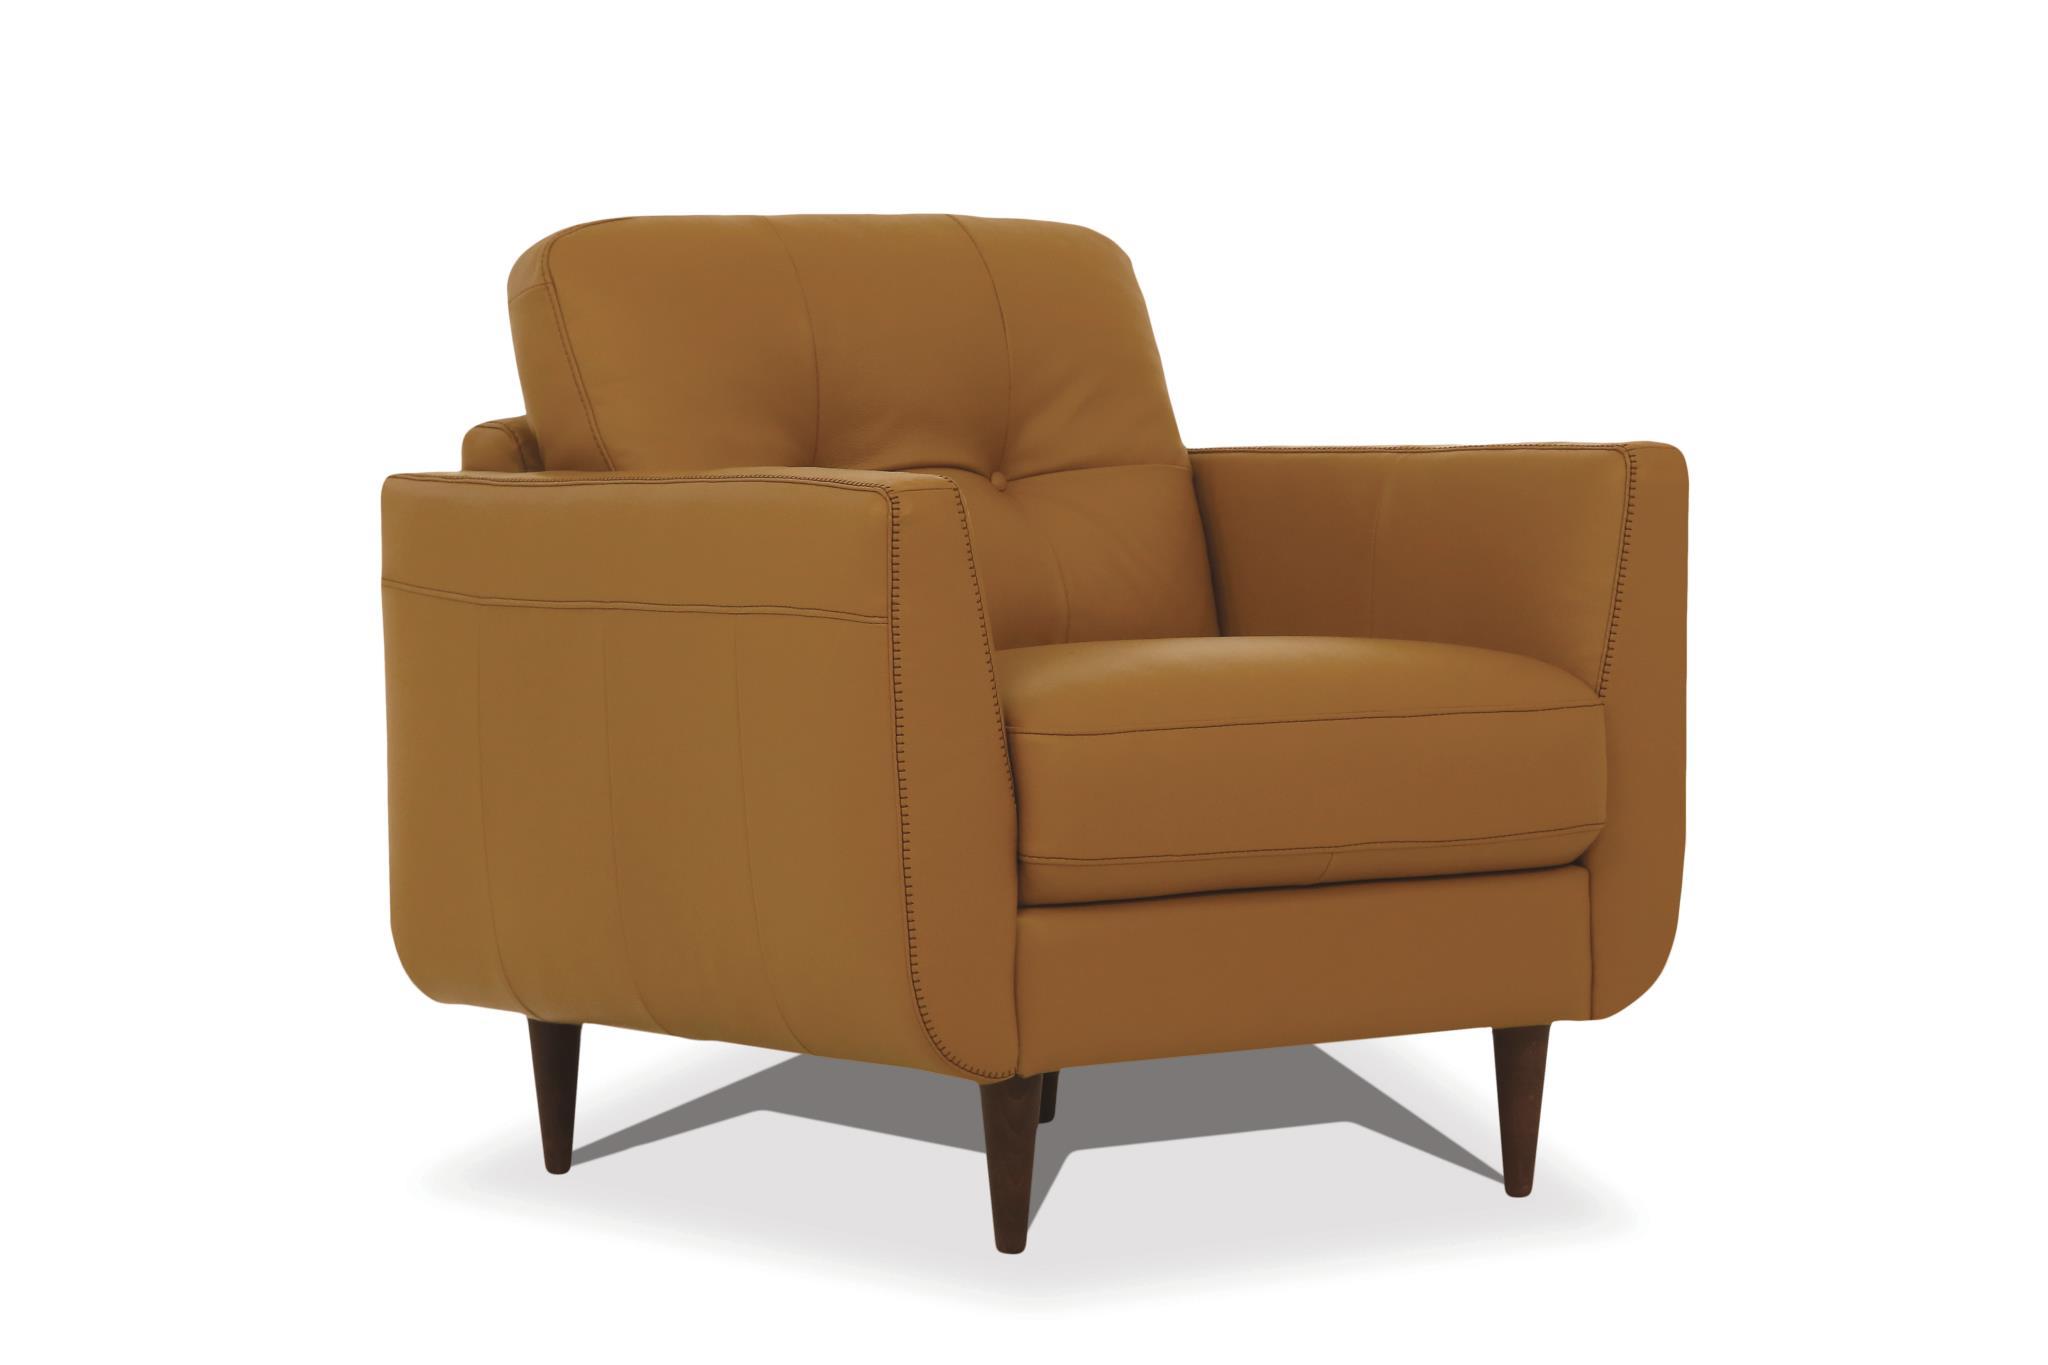 Camel Chair